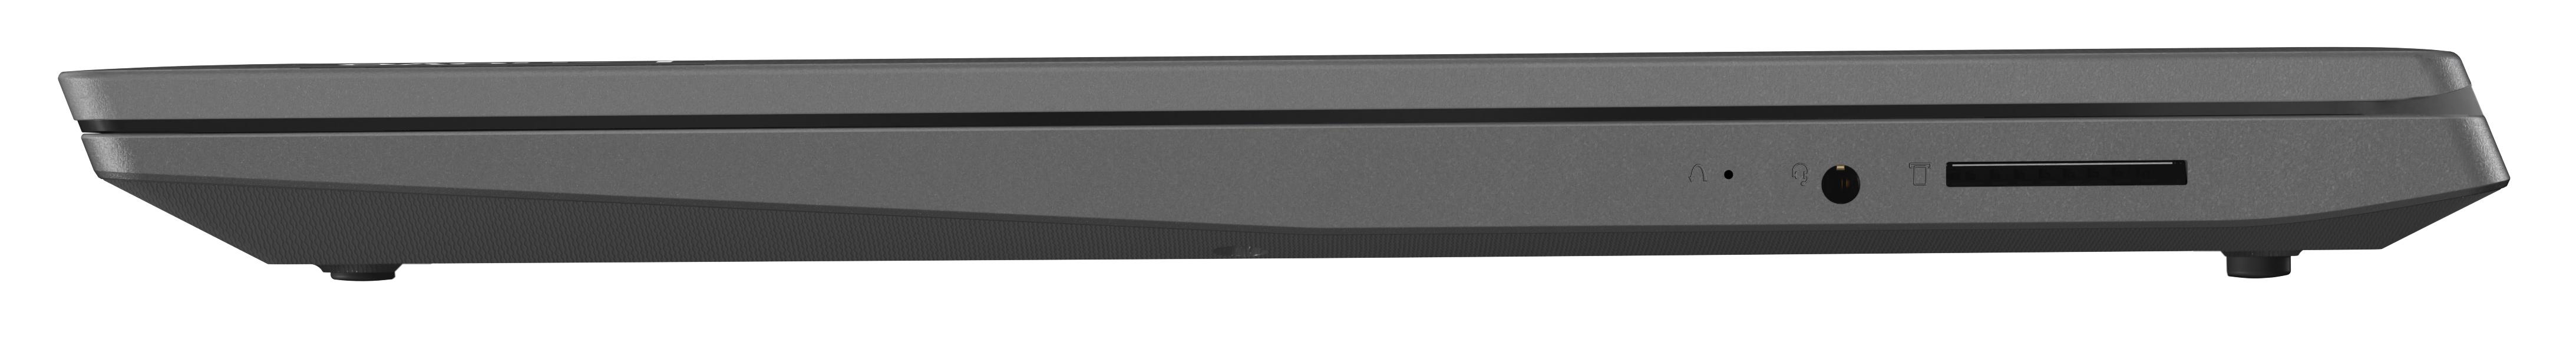 Фото  Ноутбук Lenovo V15 ADA Iron Grey (82C7009URU)